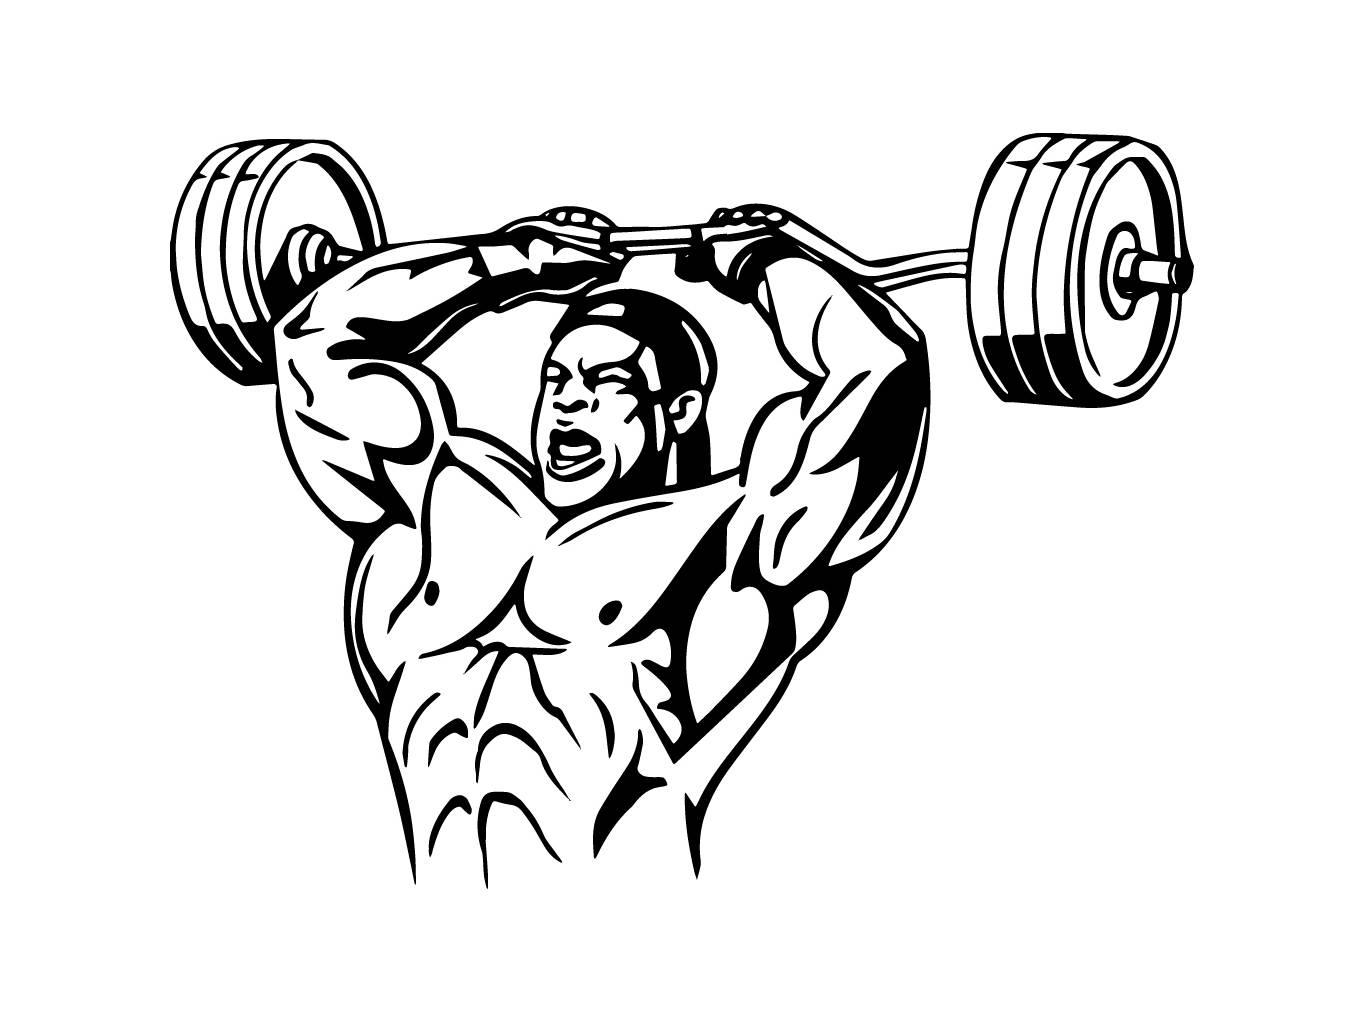 1363x1025 Bodybuilder 18 Bodybuilding Logo Front Pose Weightlifting